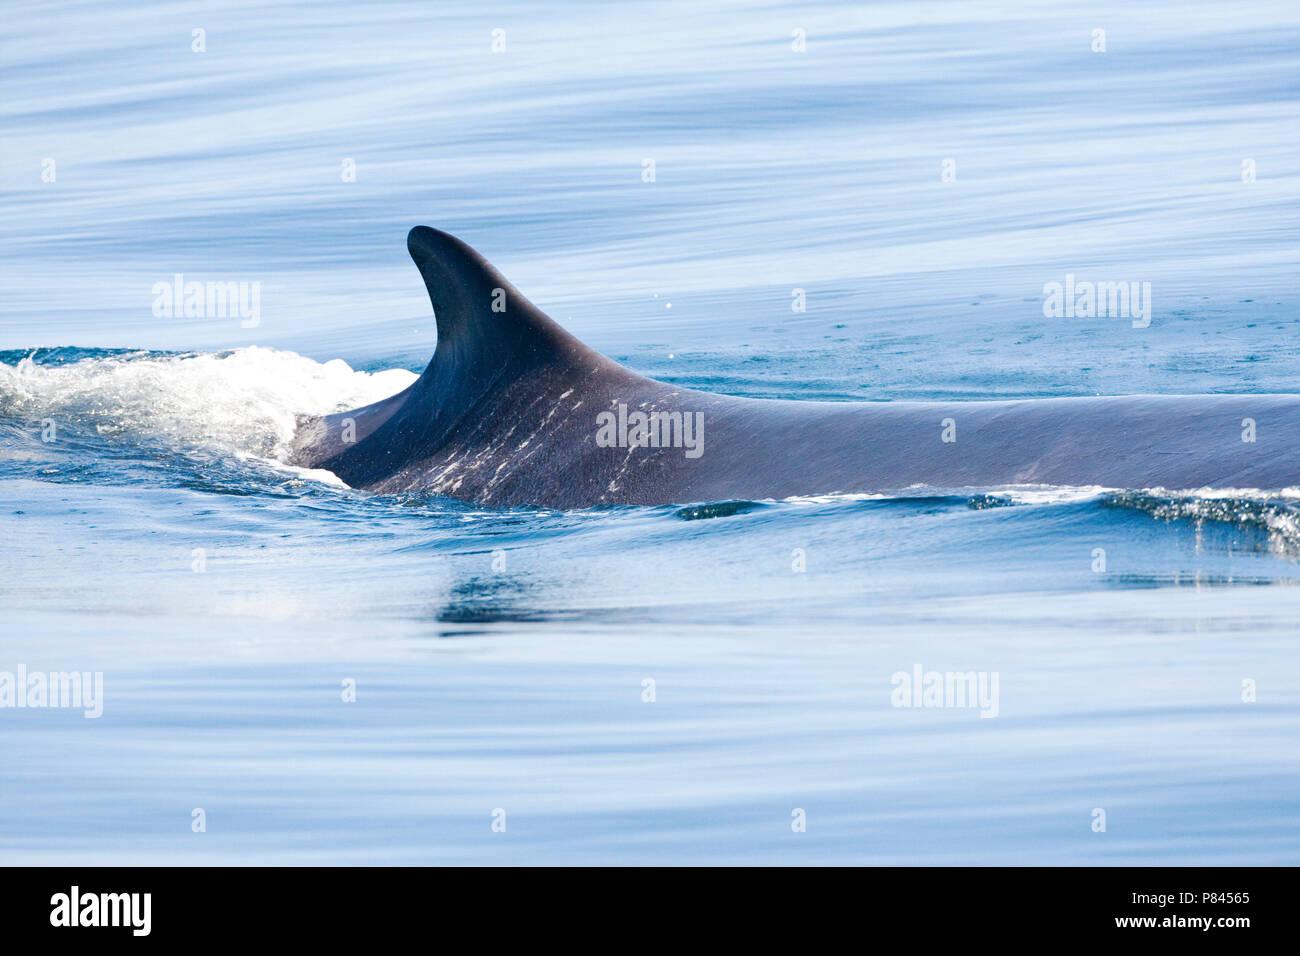 Gewone vinvis; Fin whale - Stock Image